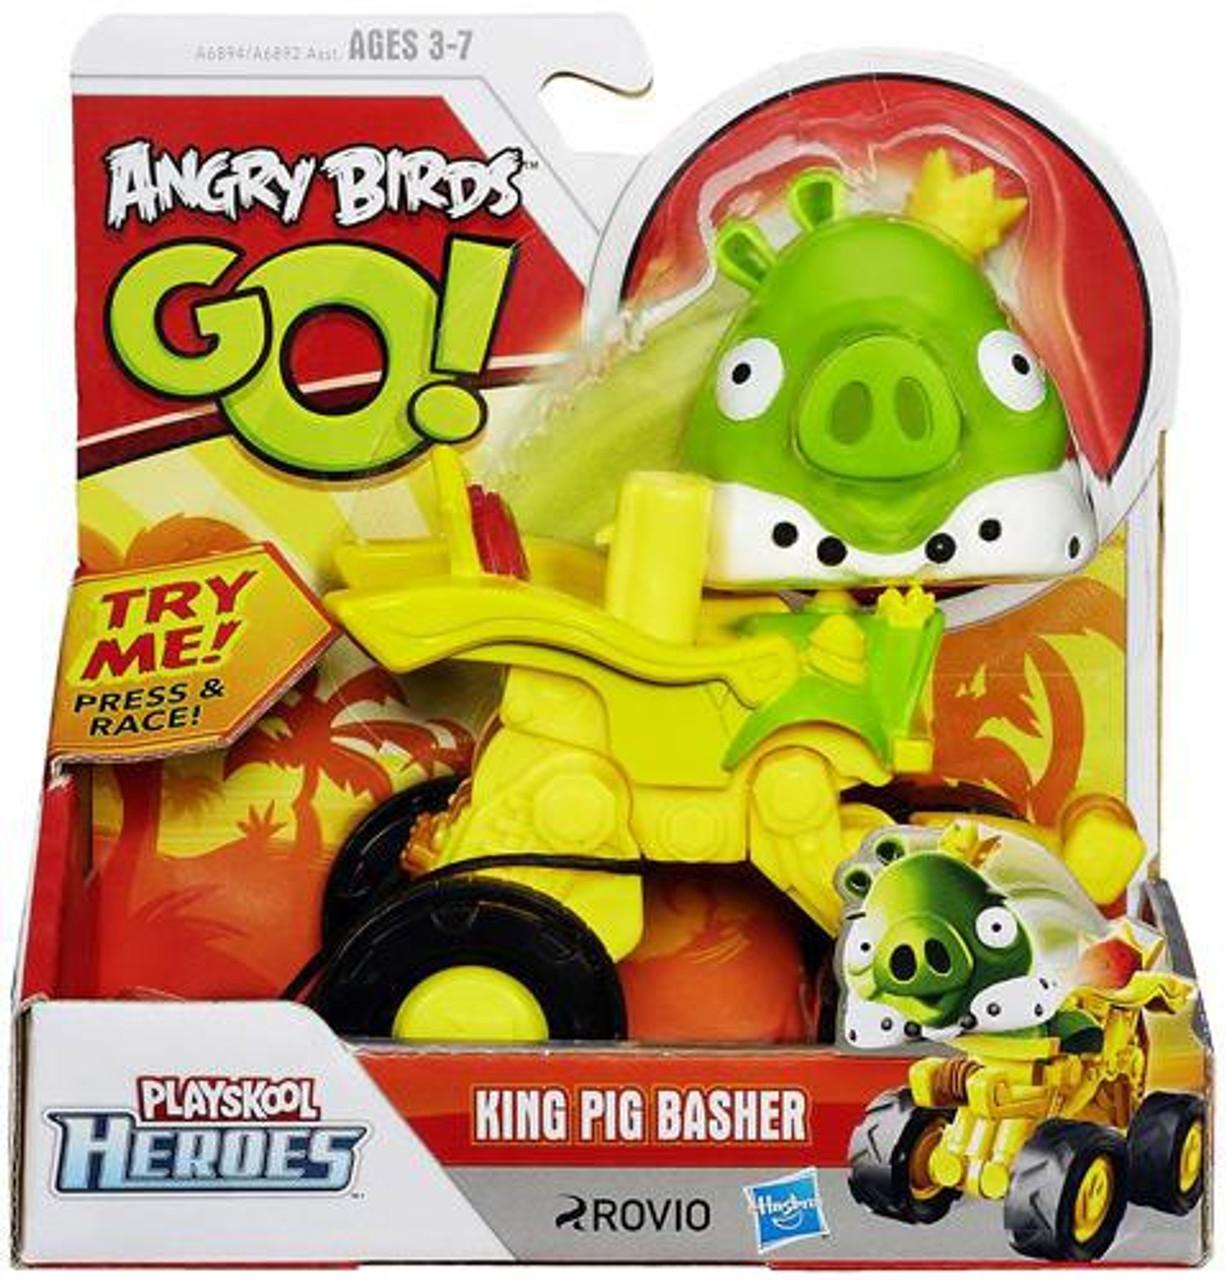 Angry Birds GO! Playskool Heroes King Pig Basher Mini Figure